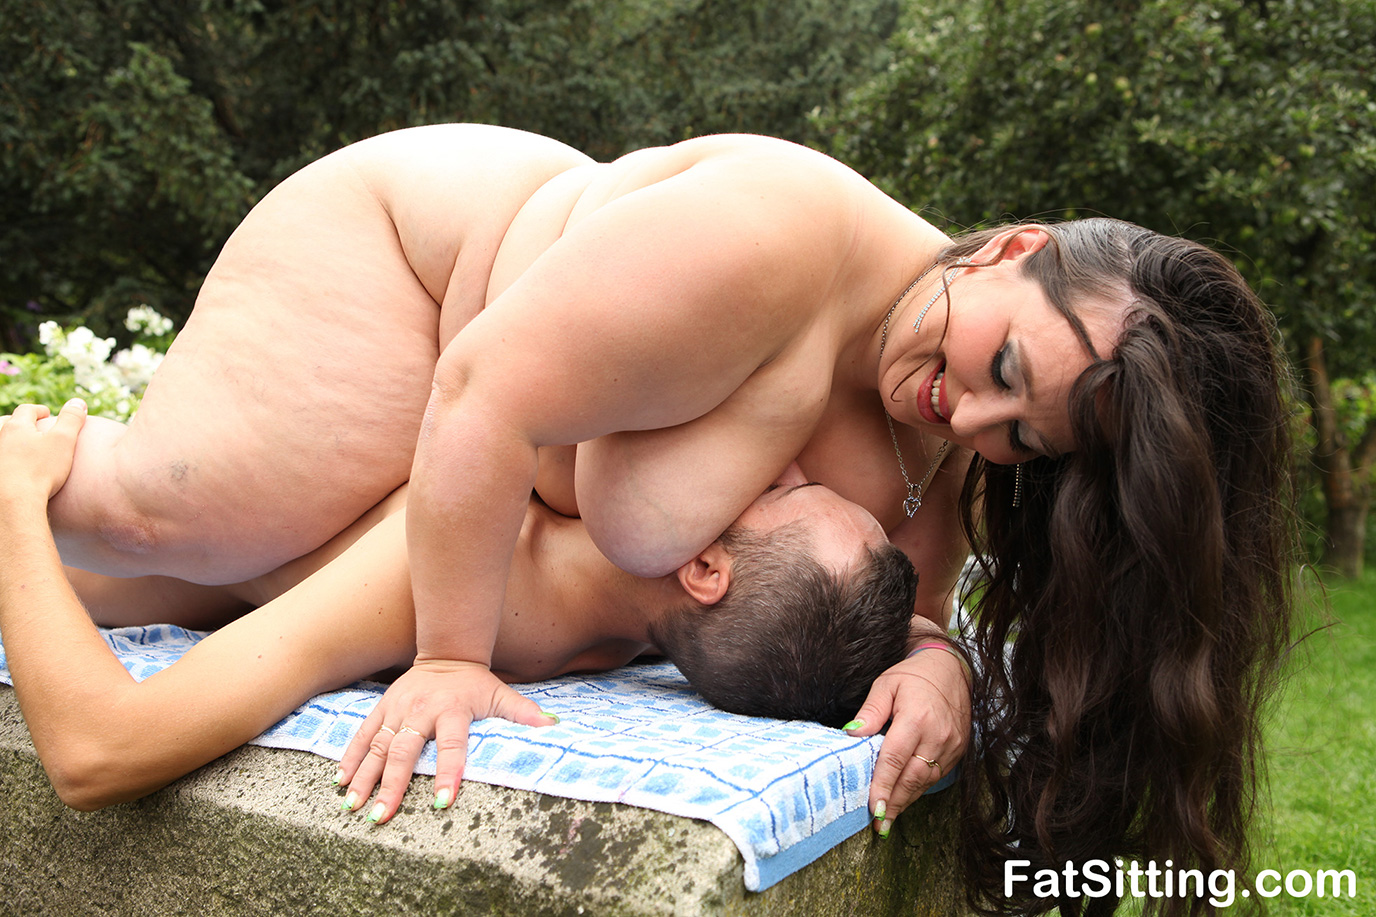 Consider, that Bbw fat women facesitting